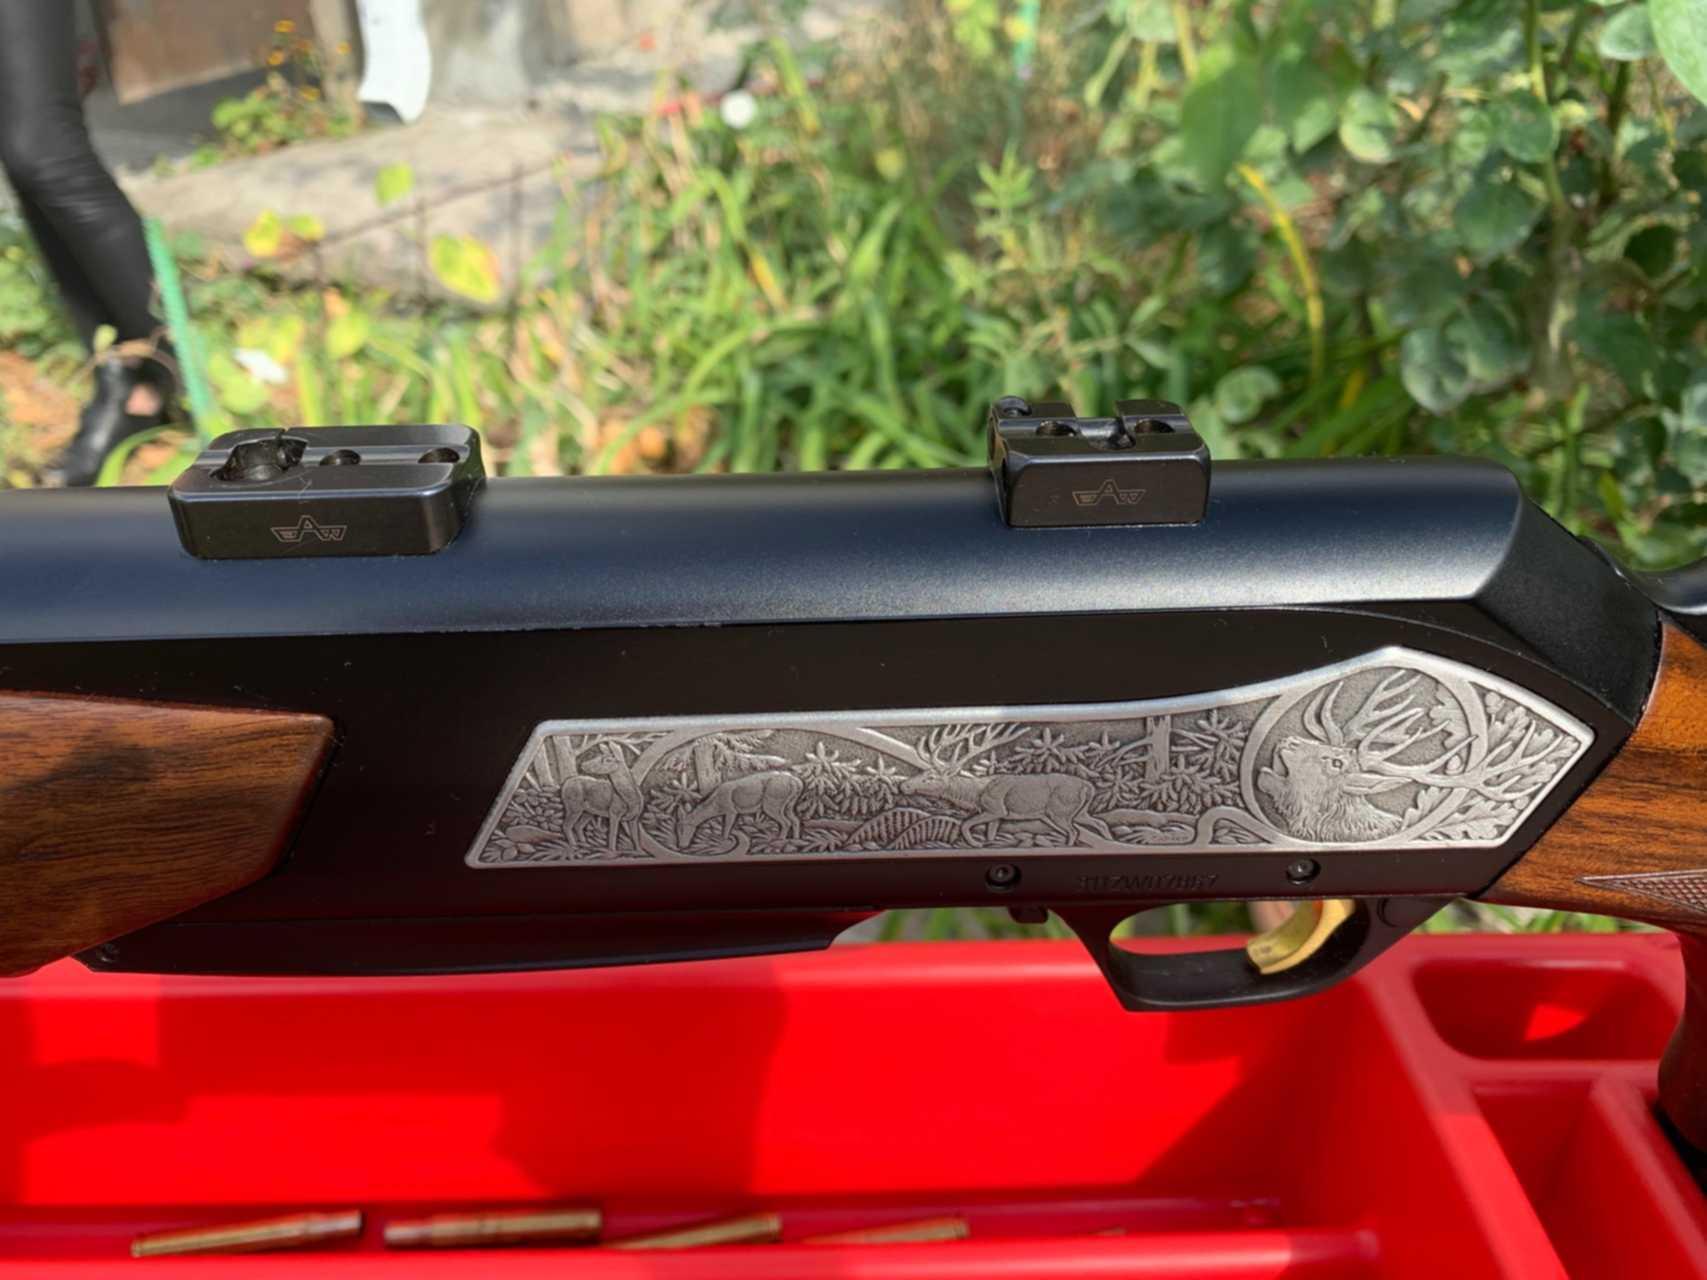 Browning bar zenith карабин — характеристики, фото, ттх